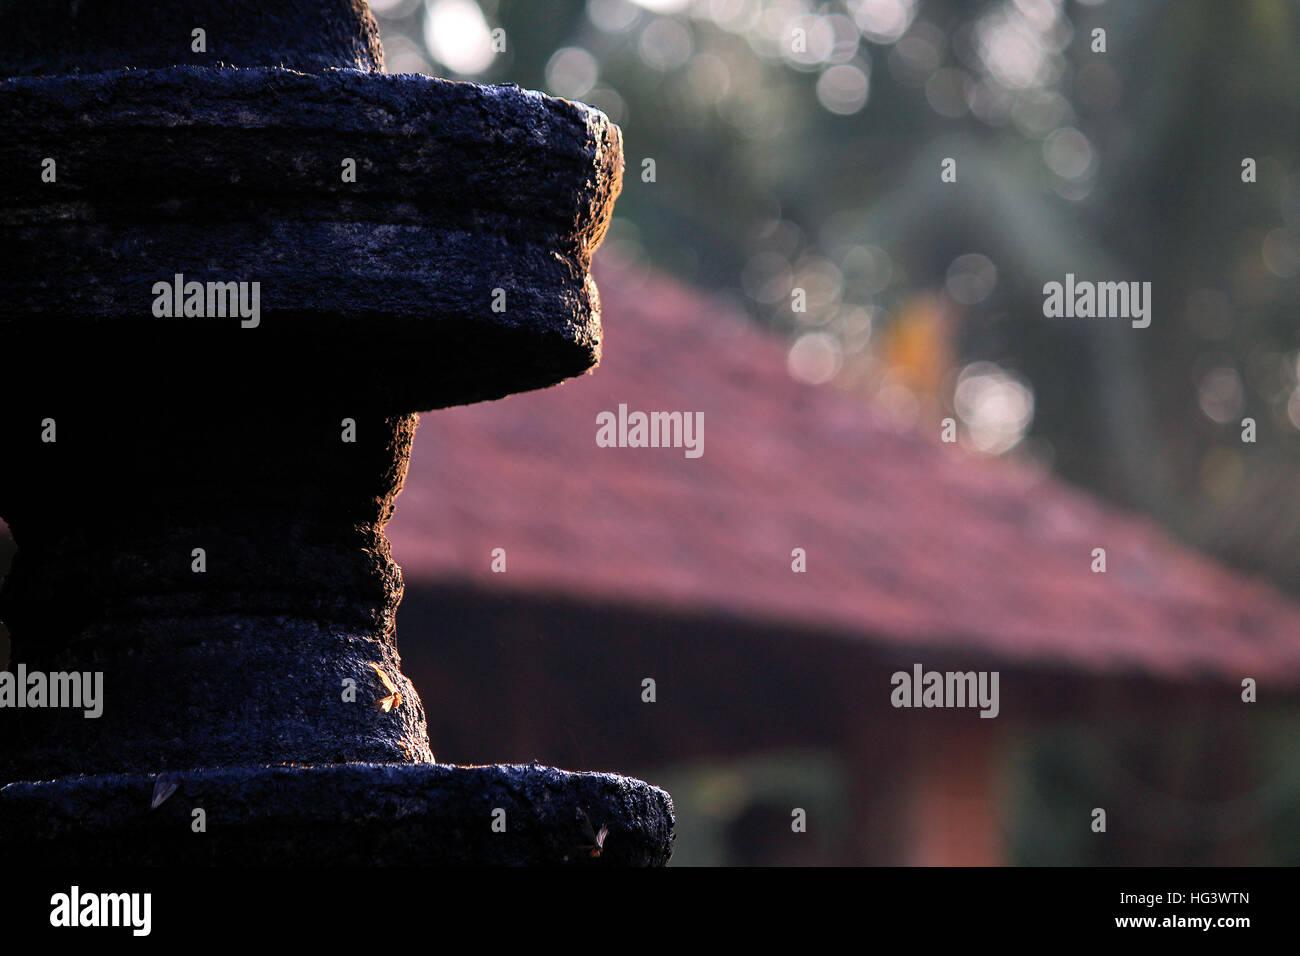 Glowing devotion - Stock Image